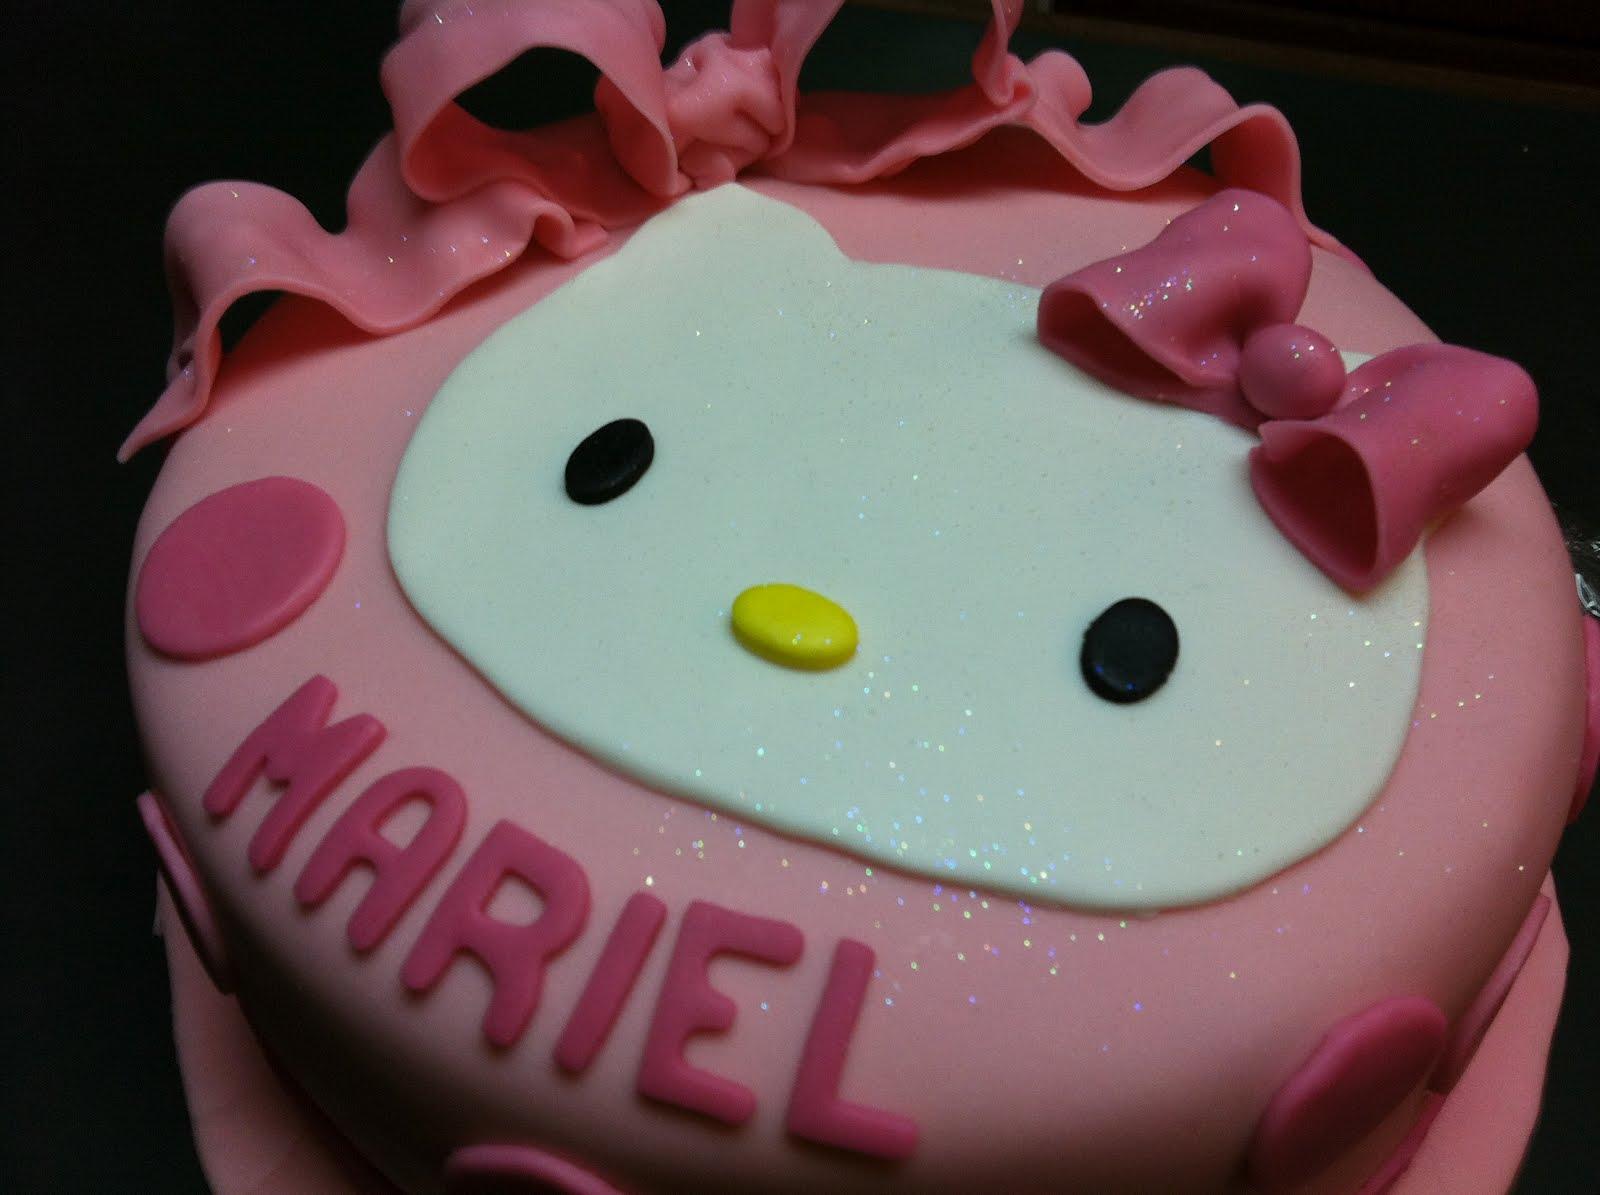 Cake Hello Kitty Pink : PINK HELLO KITTY CAKE ..... ....CUPaCAKE